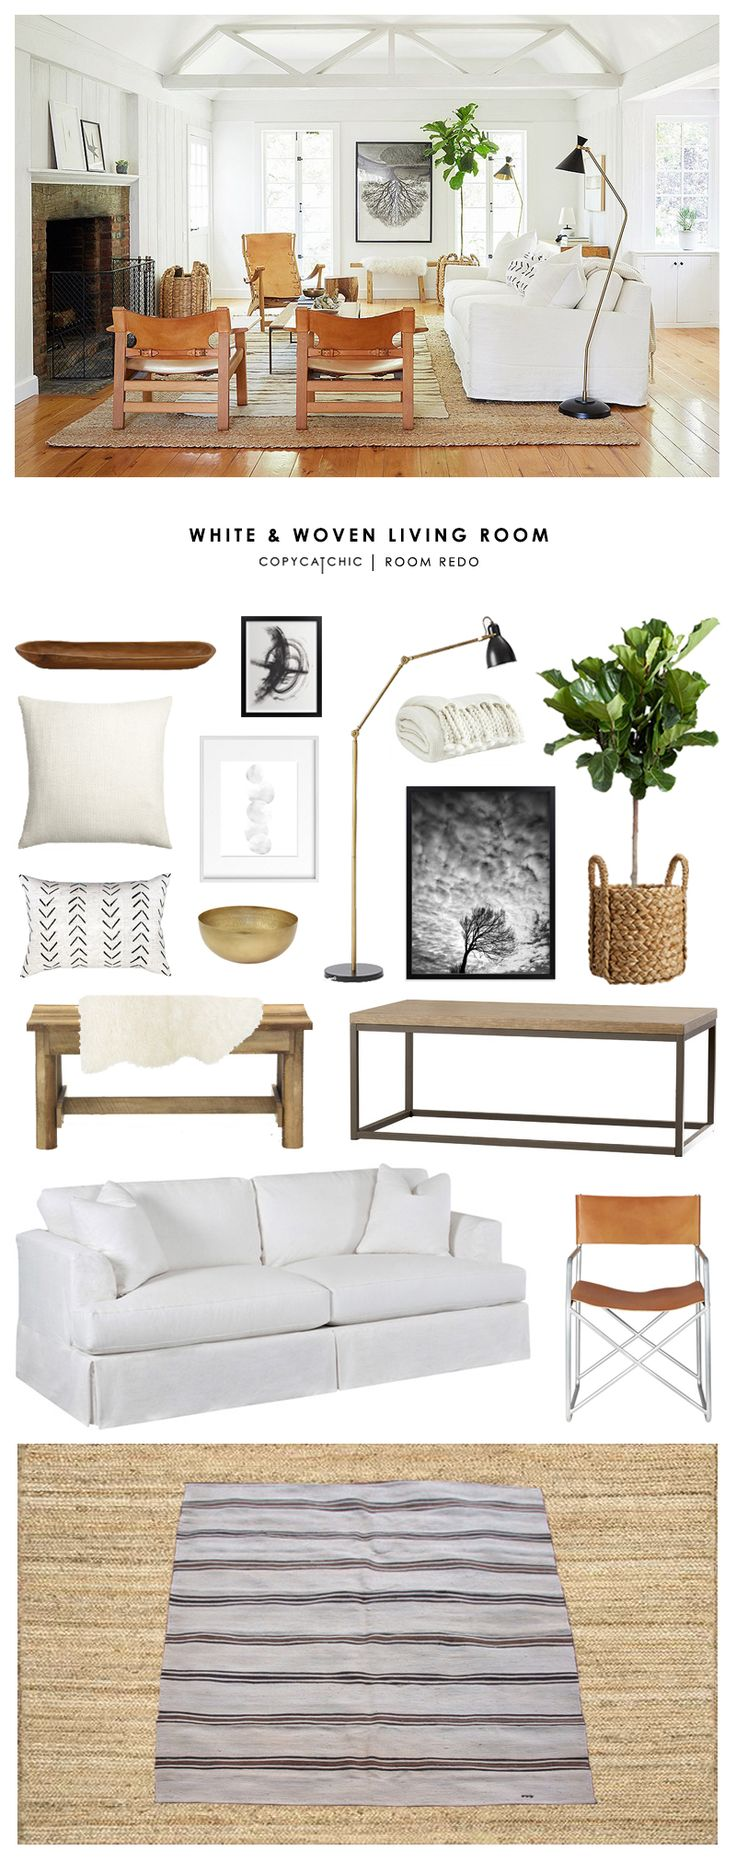 Nice Jute Rug Living Room Embellishment - Living Room Design Ideas ...